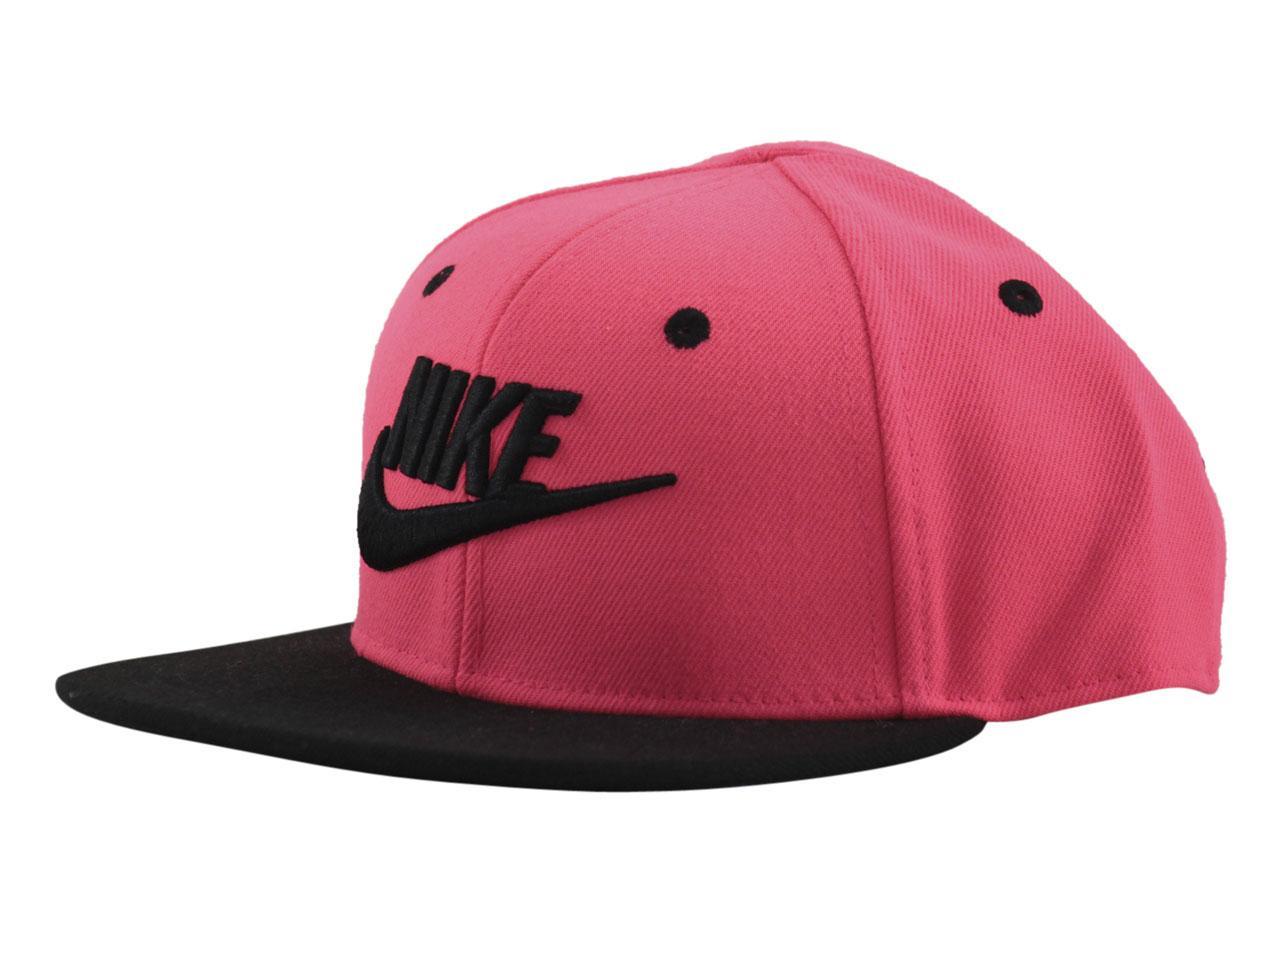 Nike Boy s True Limitless Snapback Baseball Cap Hat bade57842667